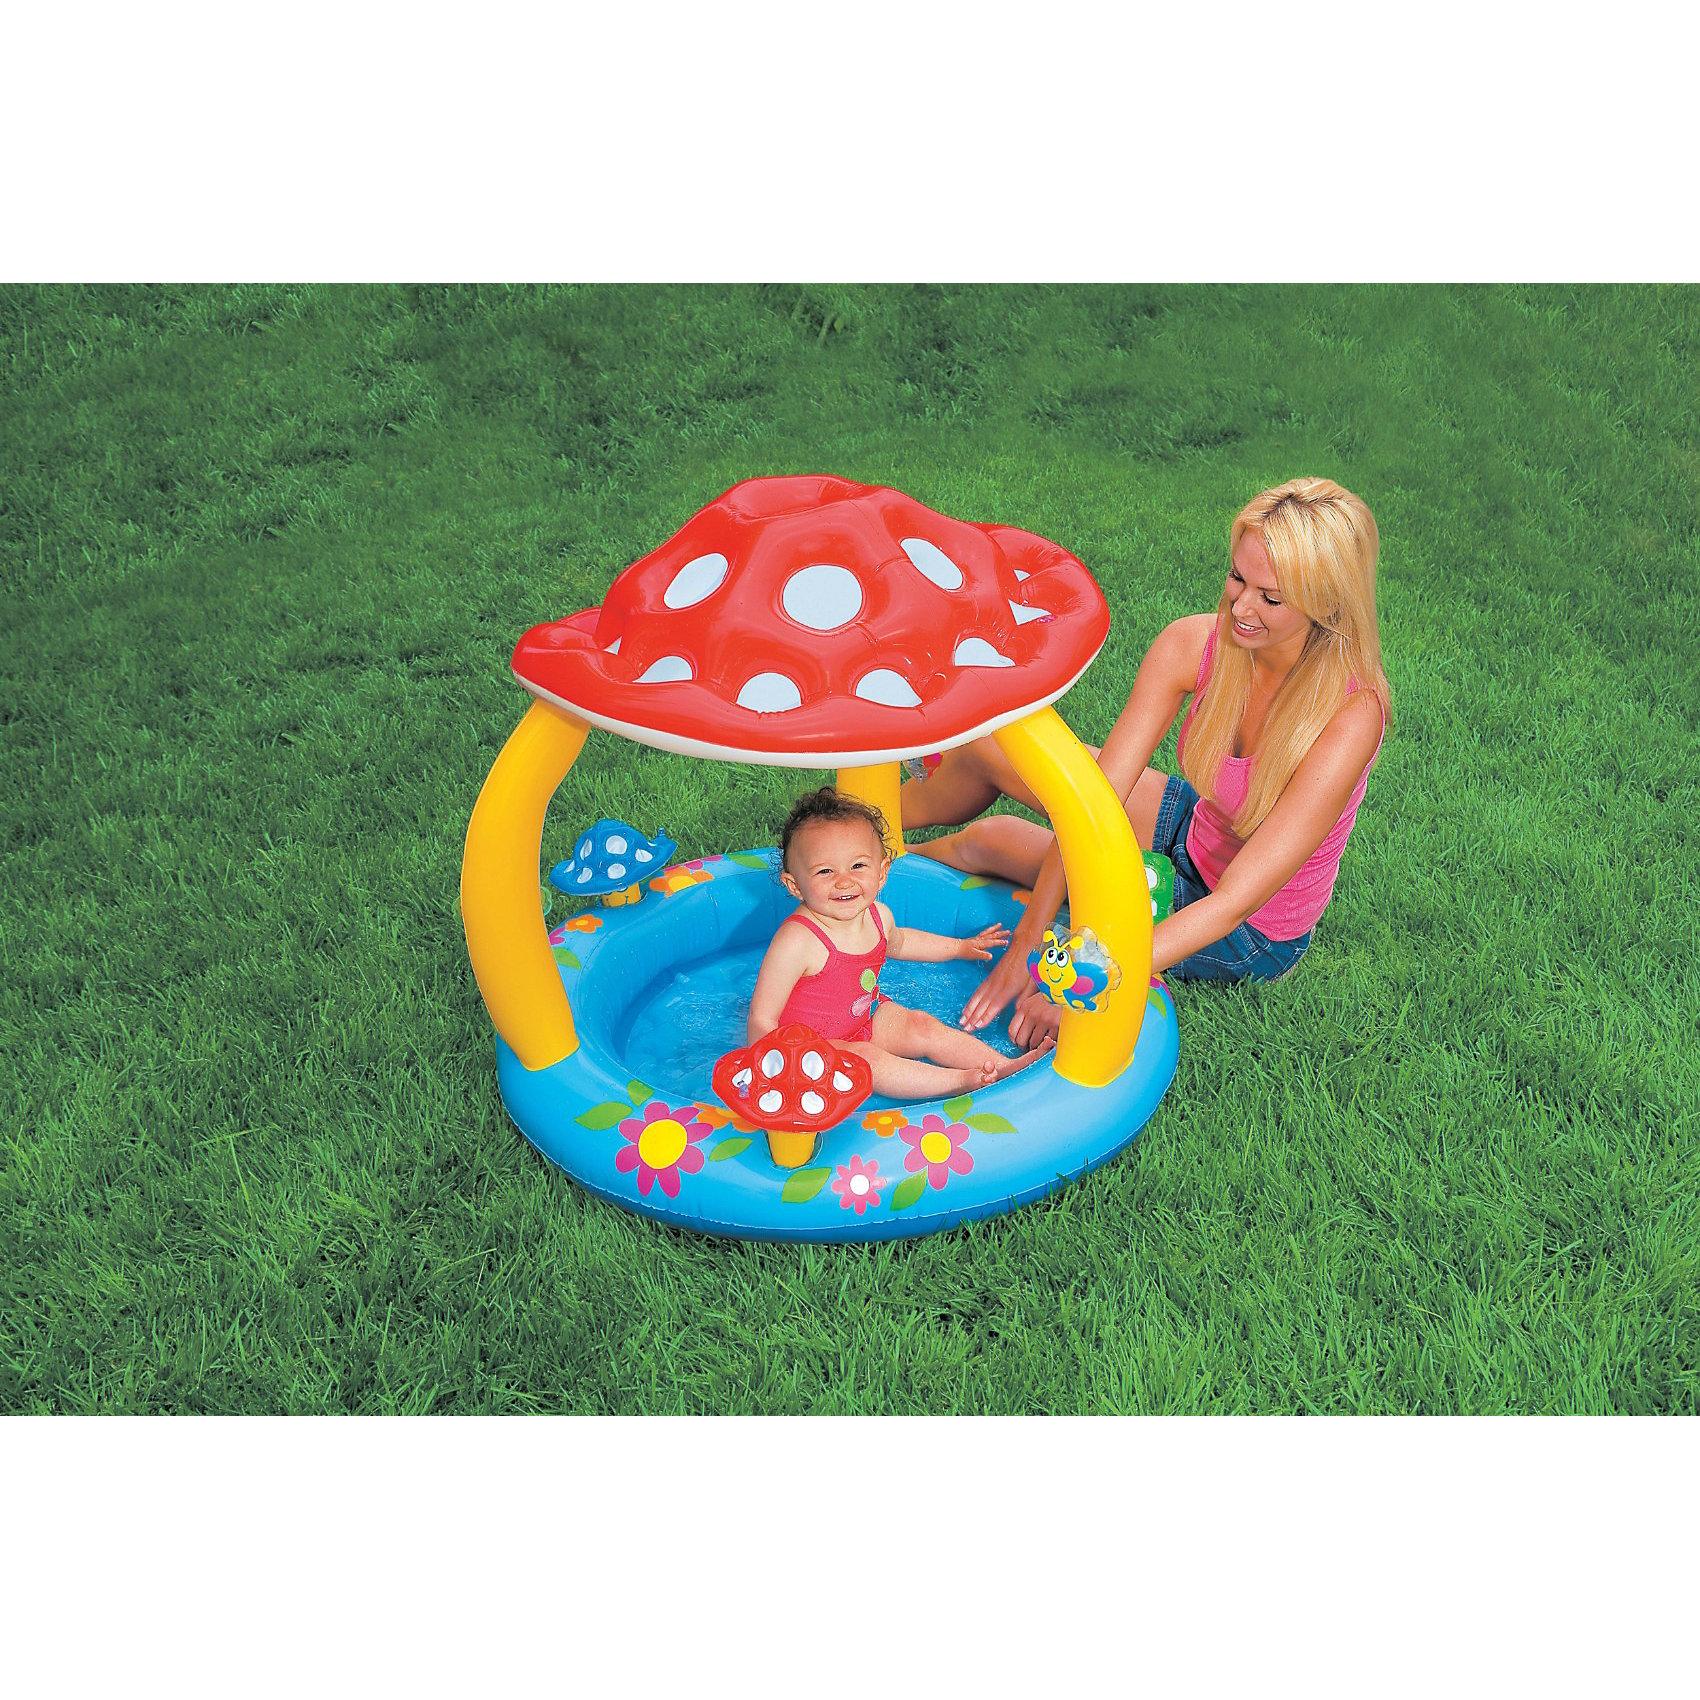 Детский надувной бассейн Мухомор, Intex